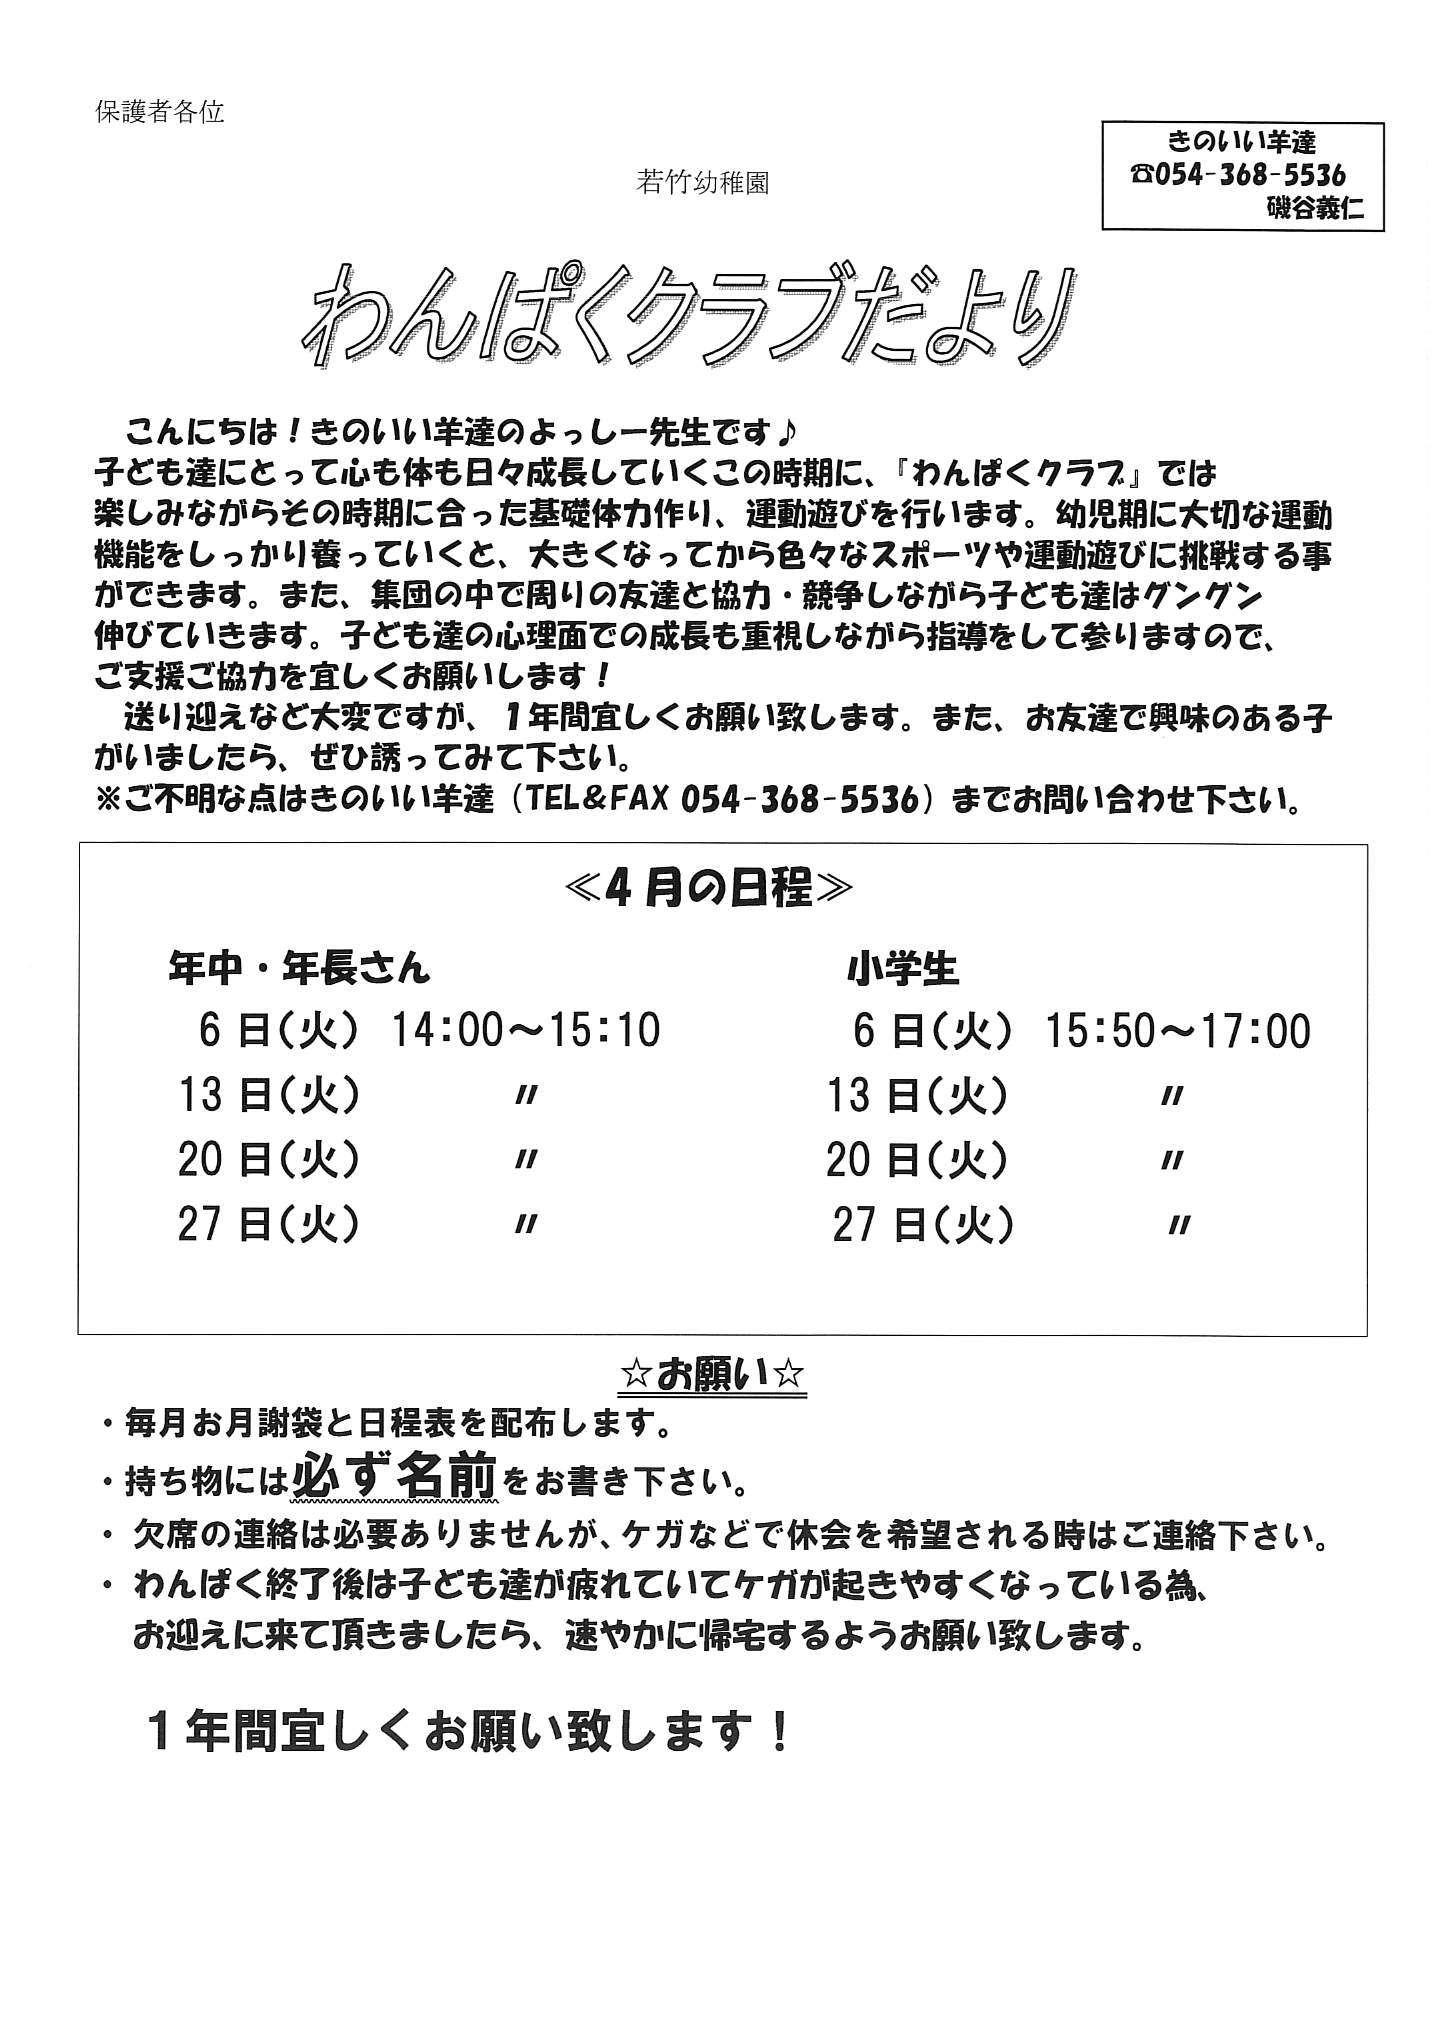 静岡 若竹幼稚園